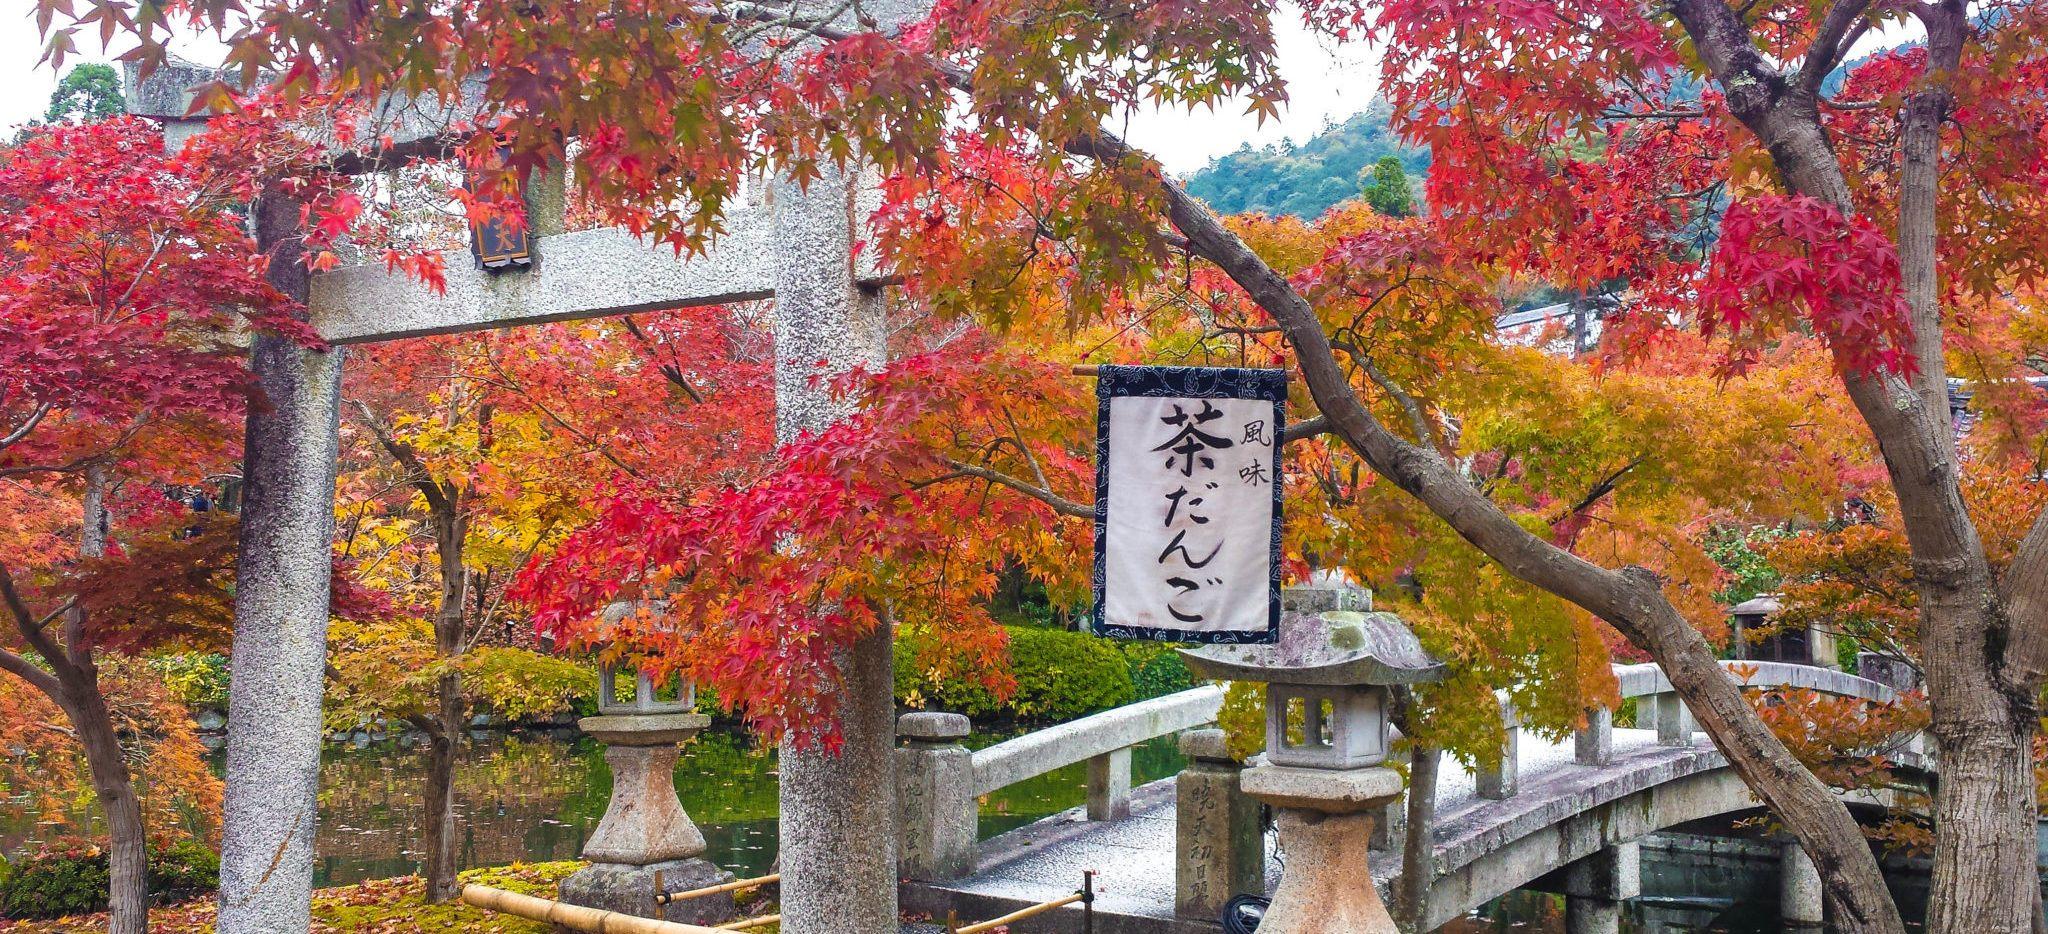 Autumn in Japan - Kyoto